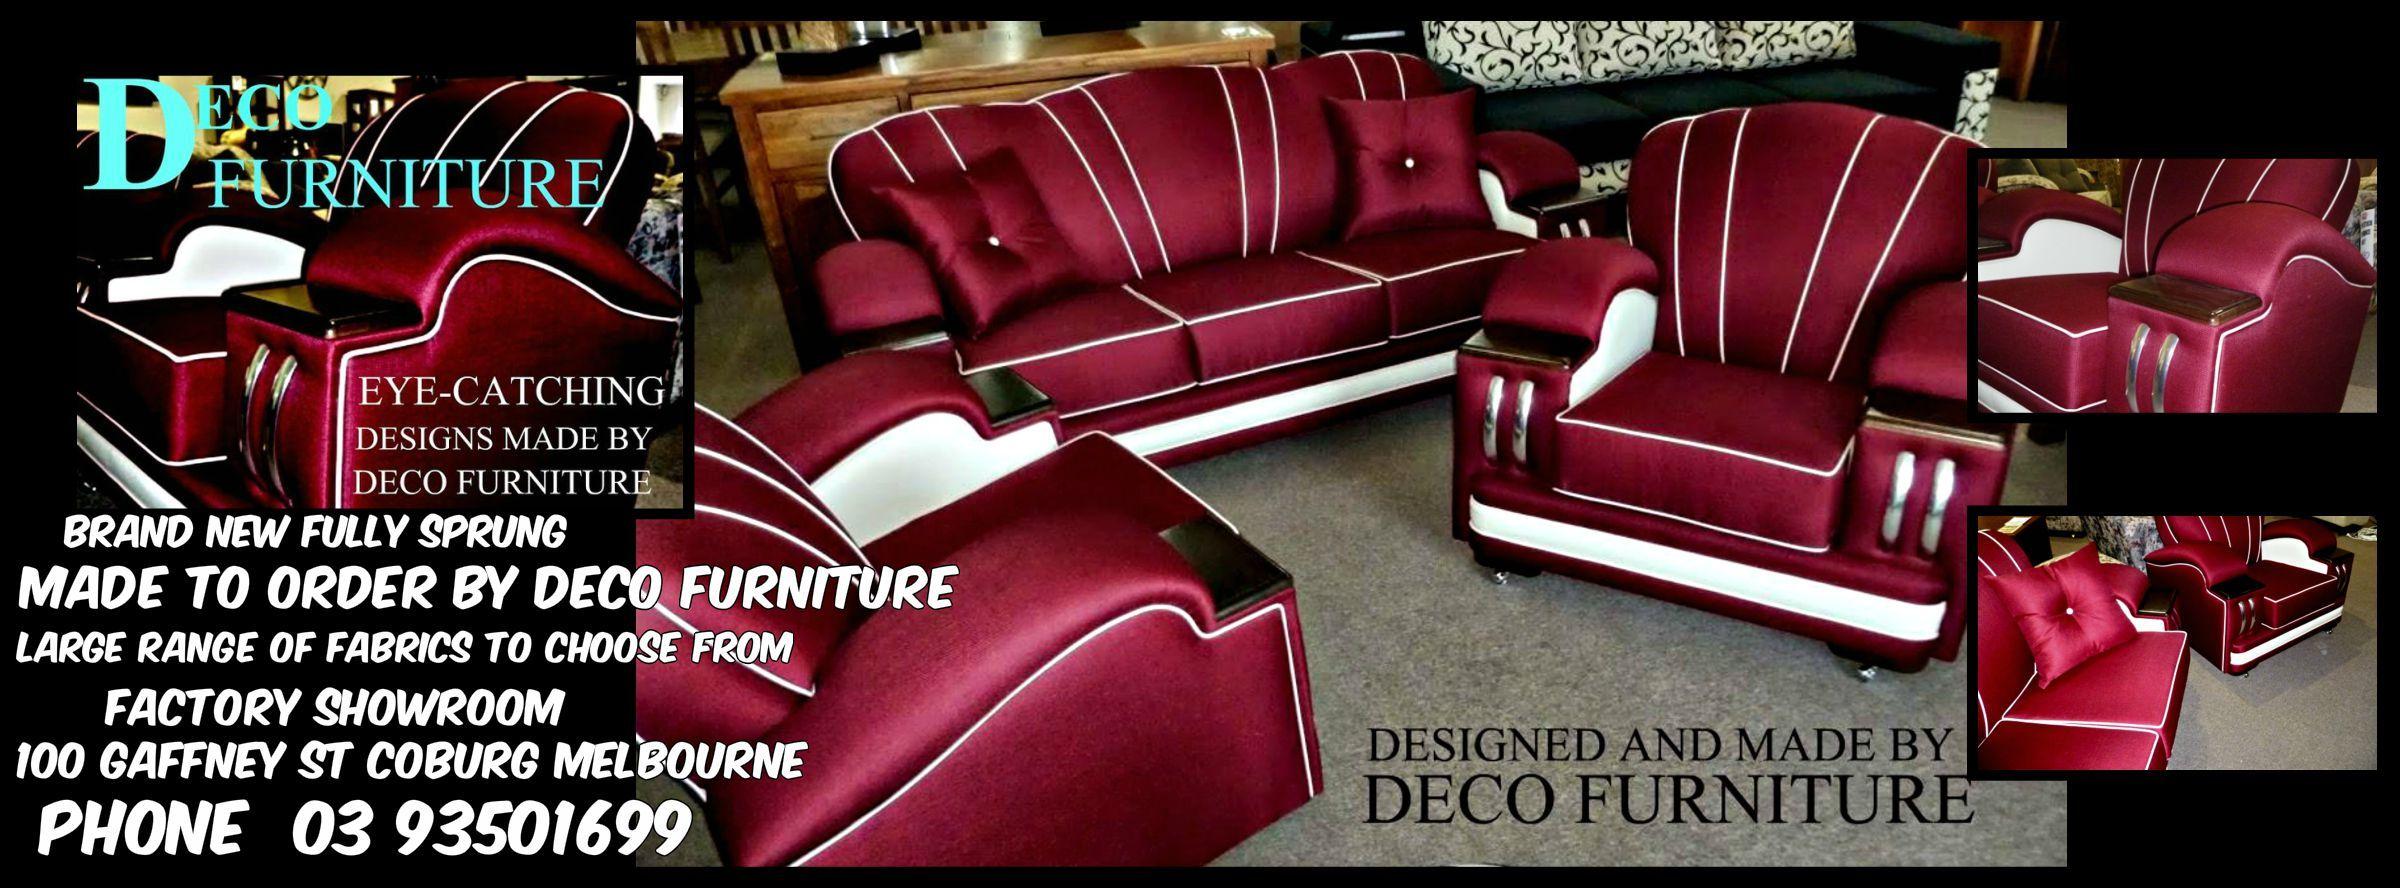 deco lounges made by  deco furniture  100 gaffney st coburg melbourne phone 03 93501699 facebook  deco furniture coburg website www.decofurniture.com.au www.facebook.com/DecoFurniture.com.au.